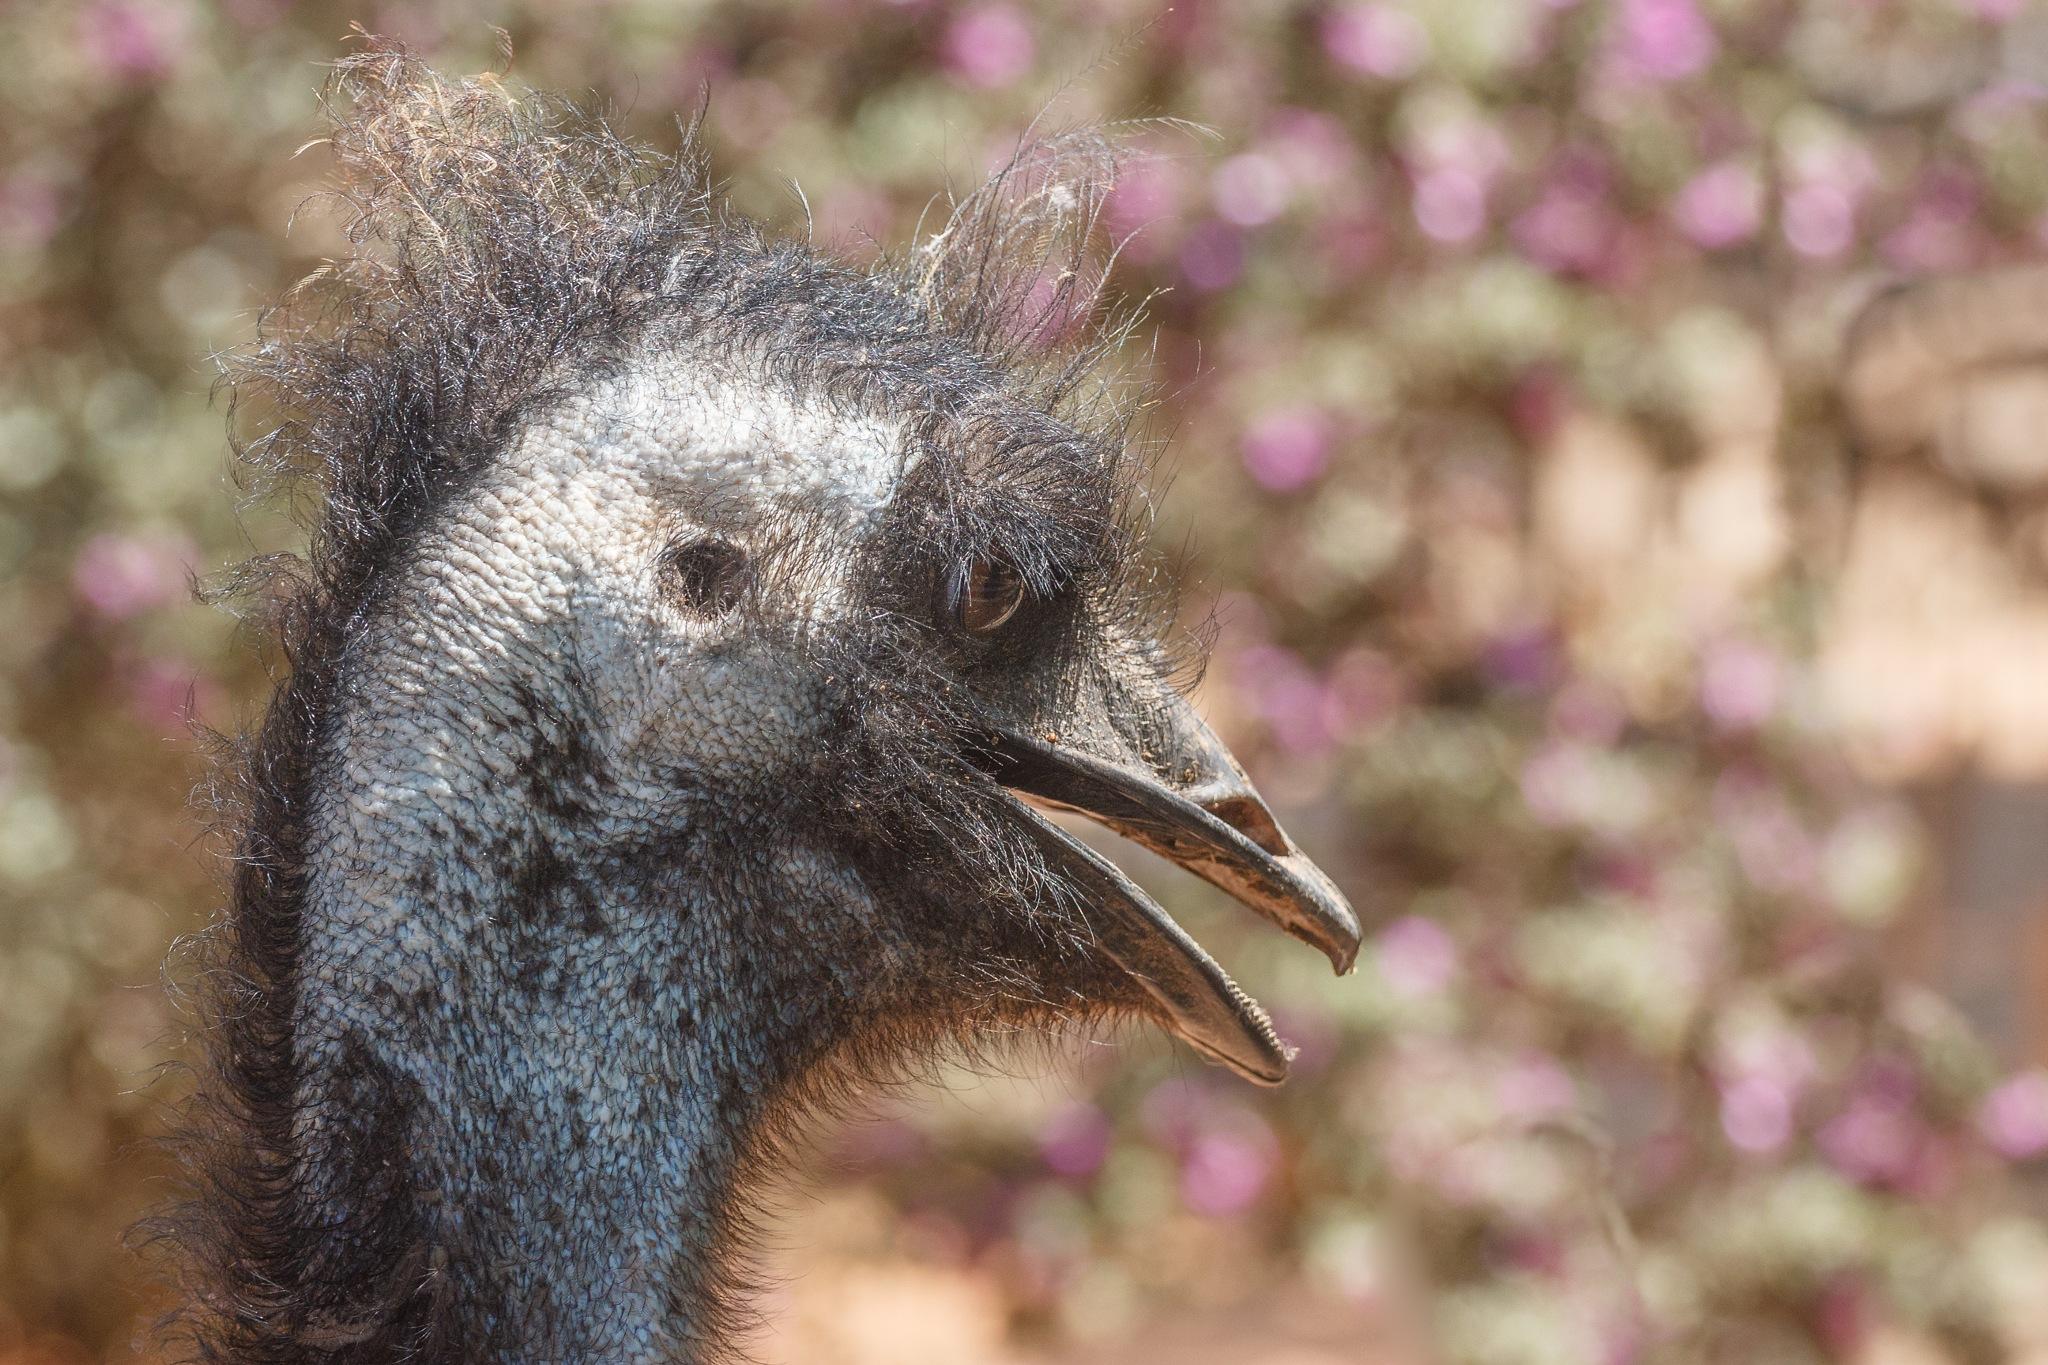 Emu in a little Zoo of t. Raanana, Israel by Anatoly Vinokurov